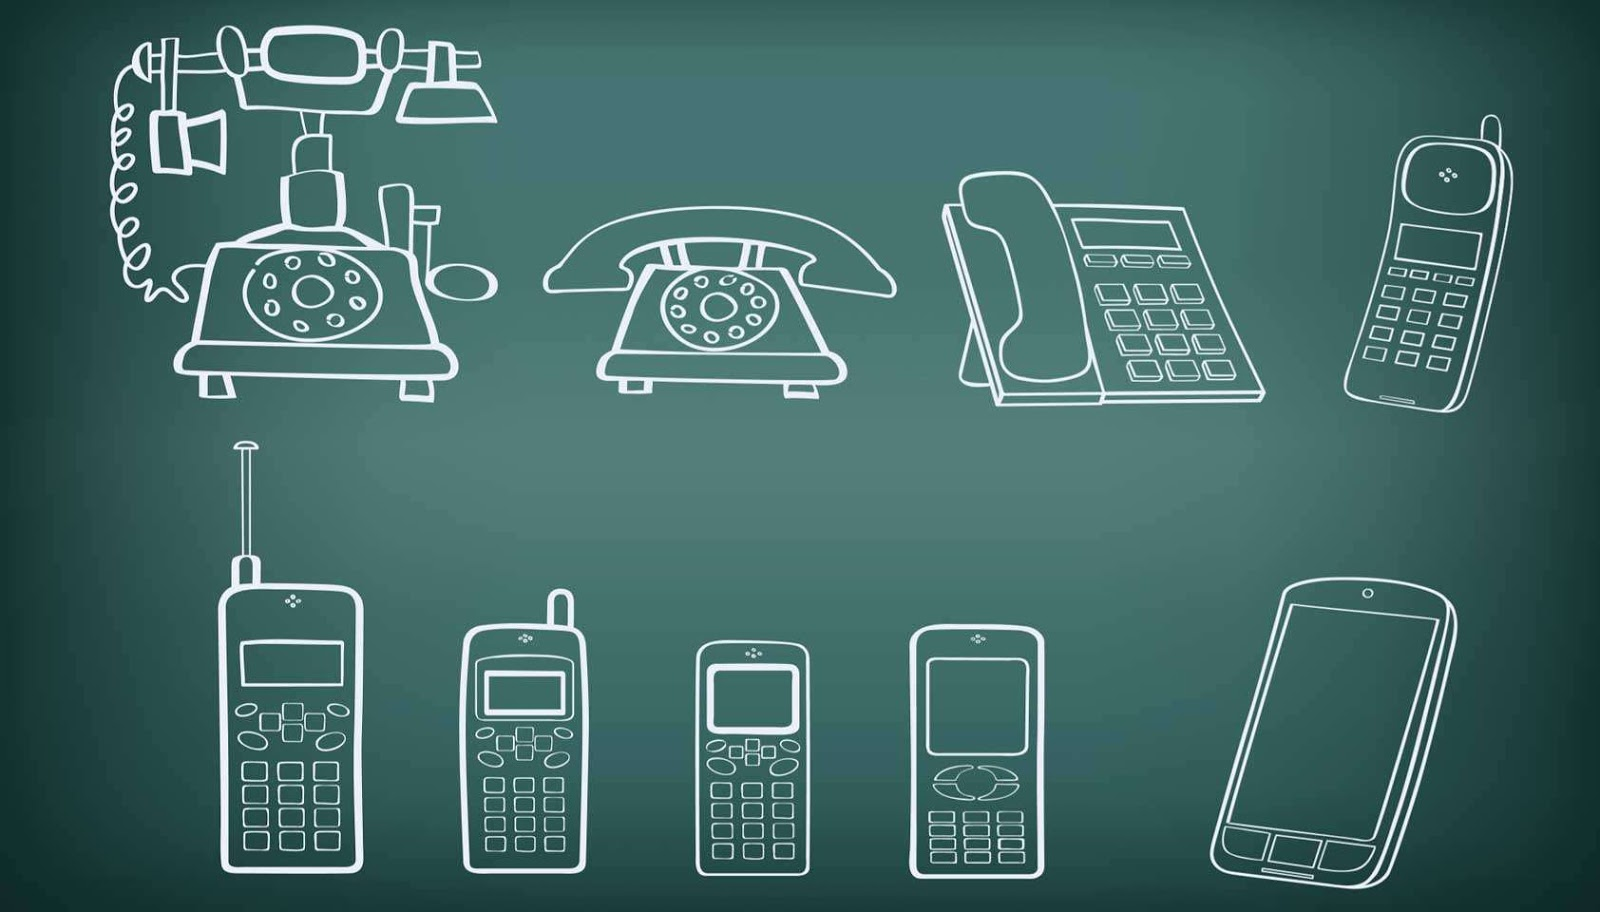 ventas telefonía móvil